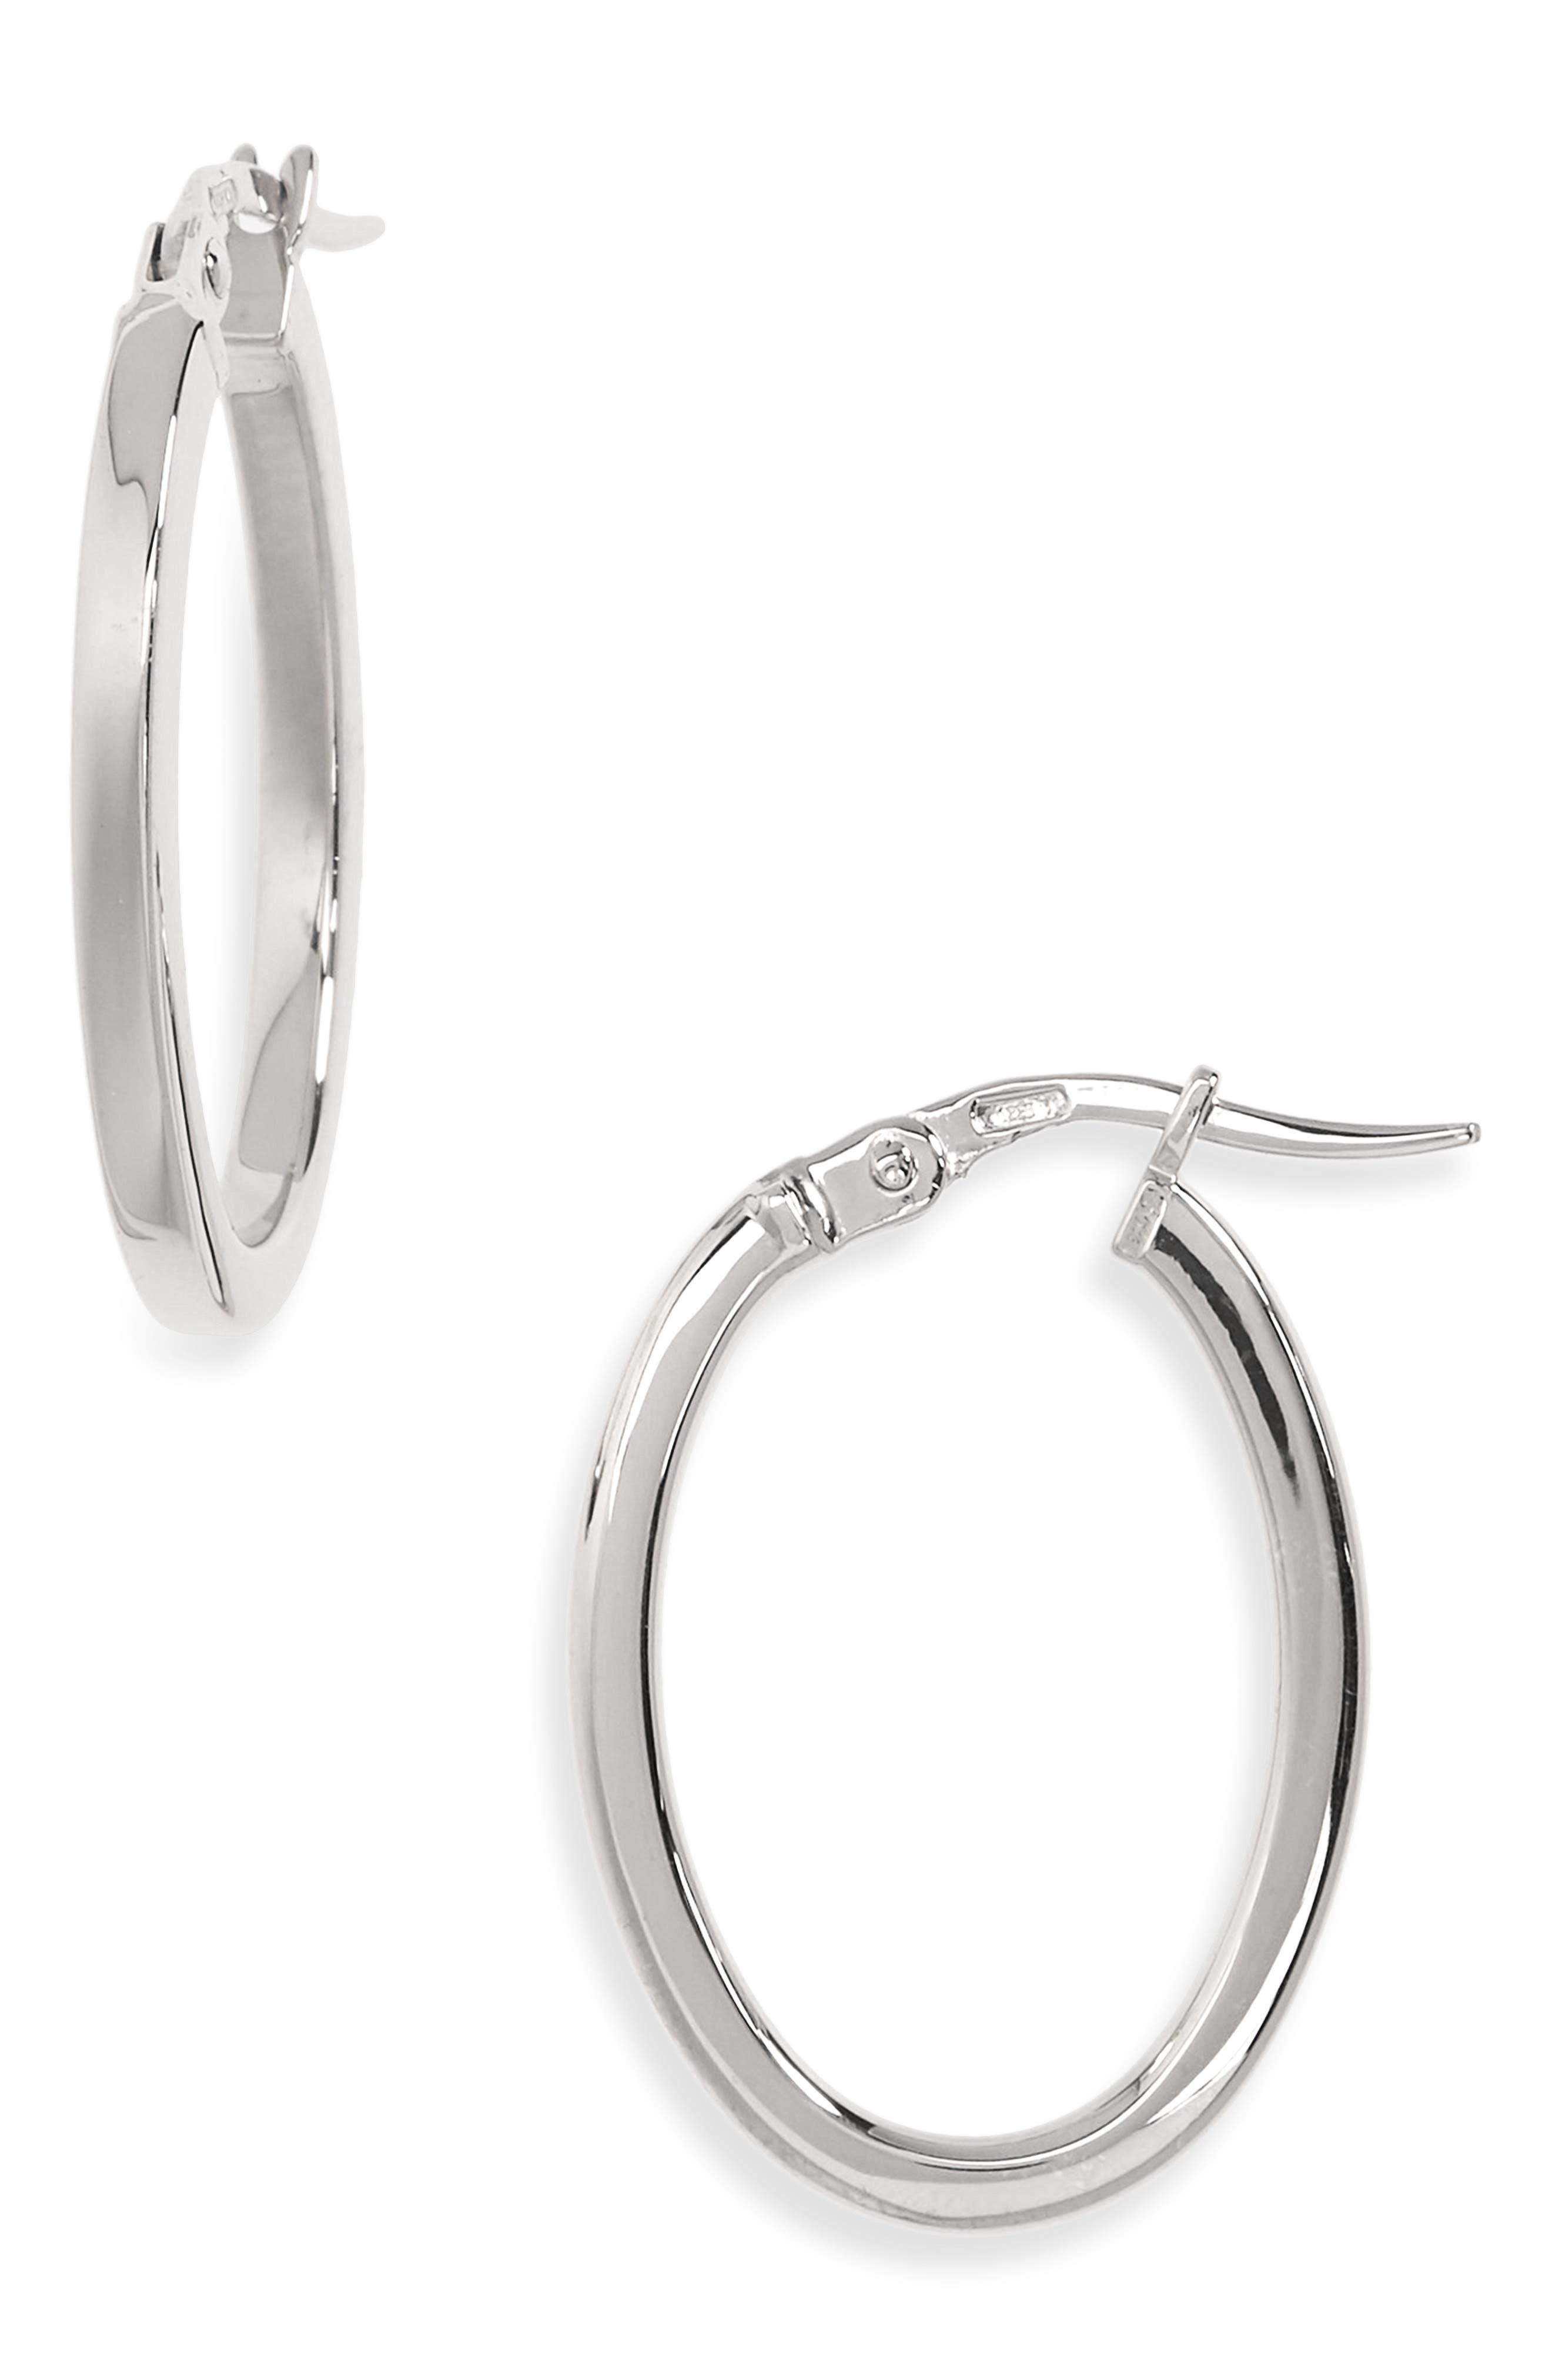 Medium Hoop Earrings,                         Main,                         color, WHITE GOLD